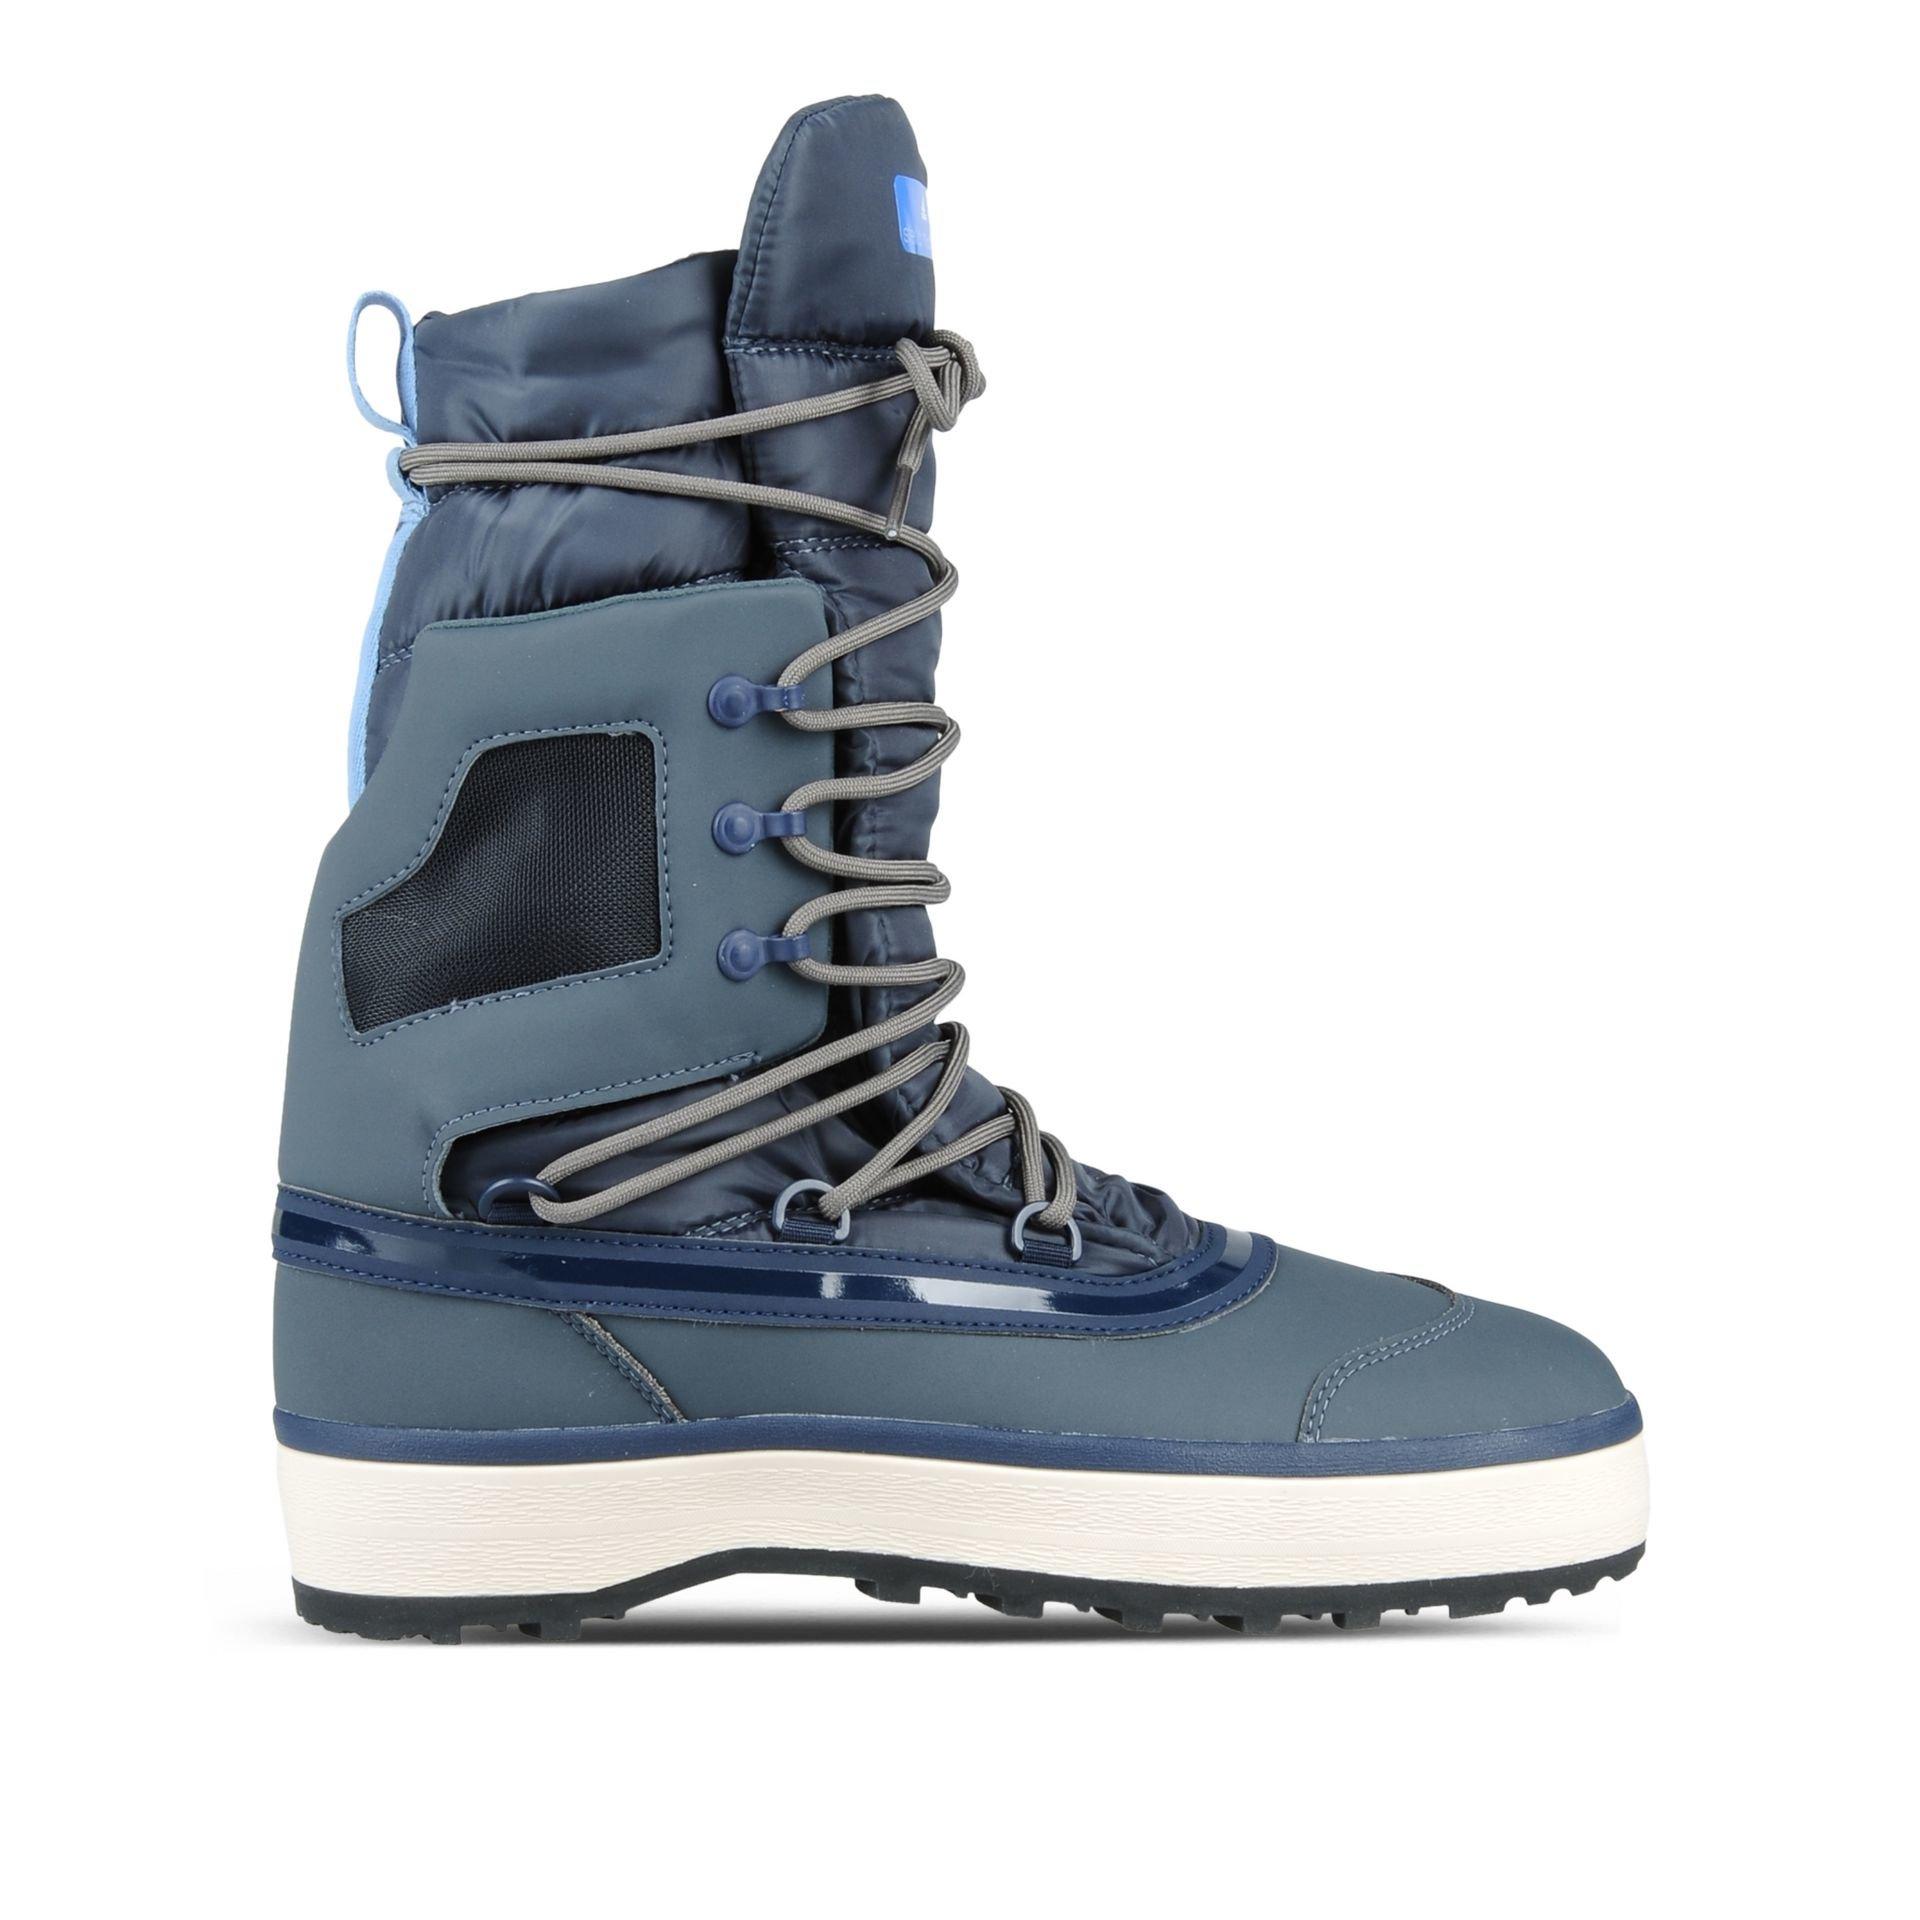 Lyst - adidas By Stella McCartney Winter Boots in Blue